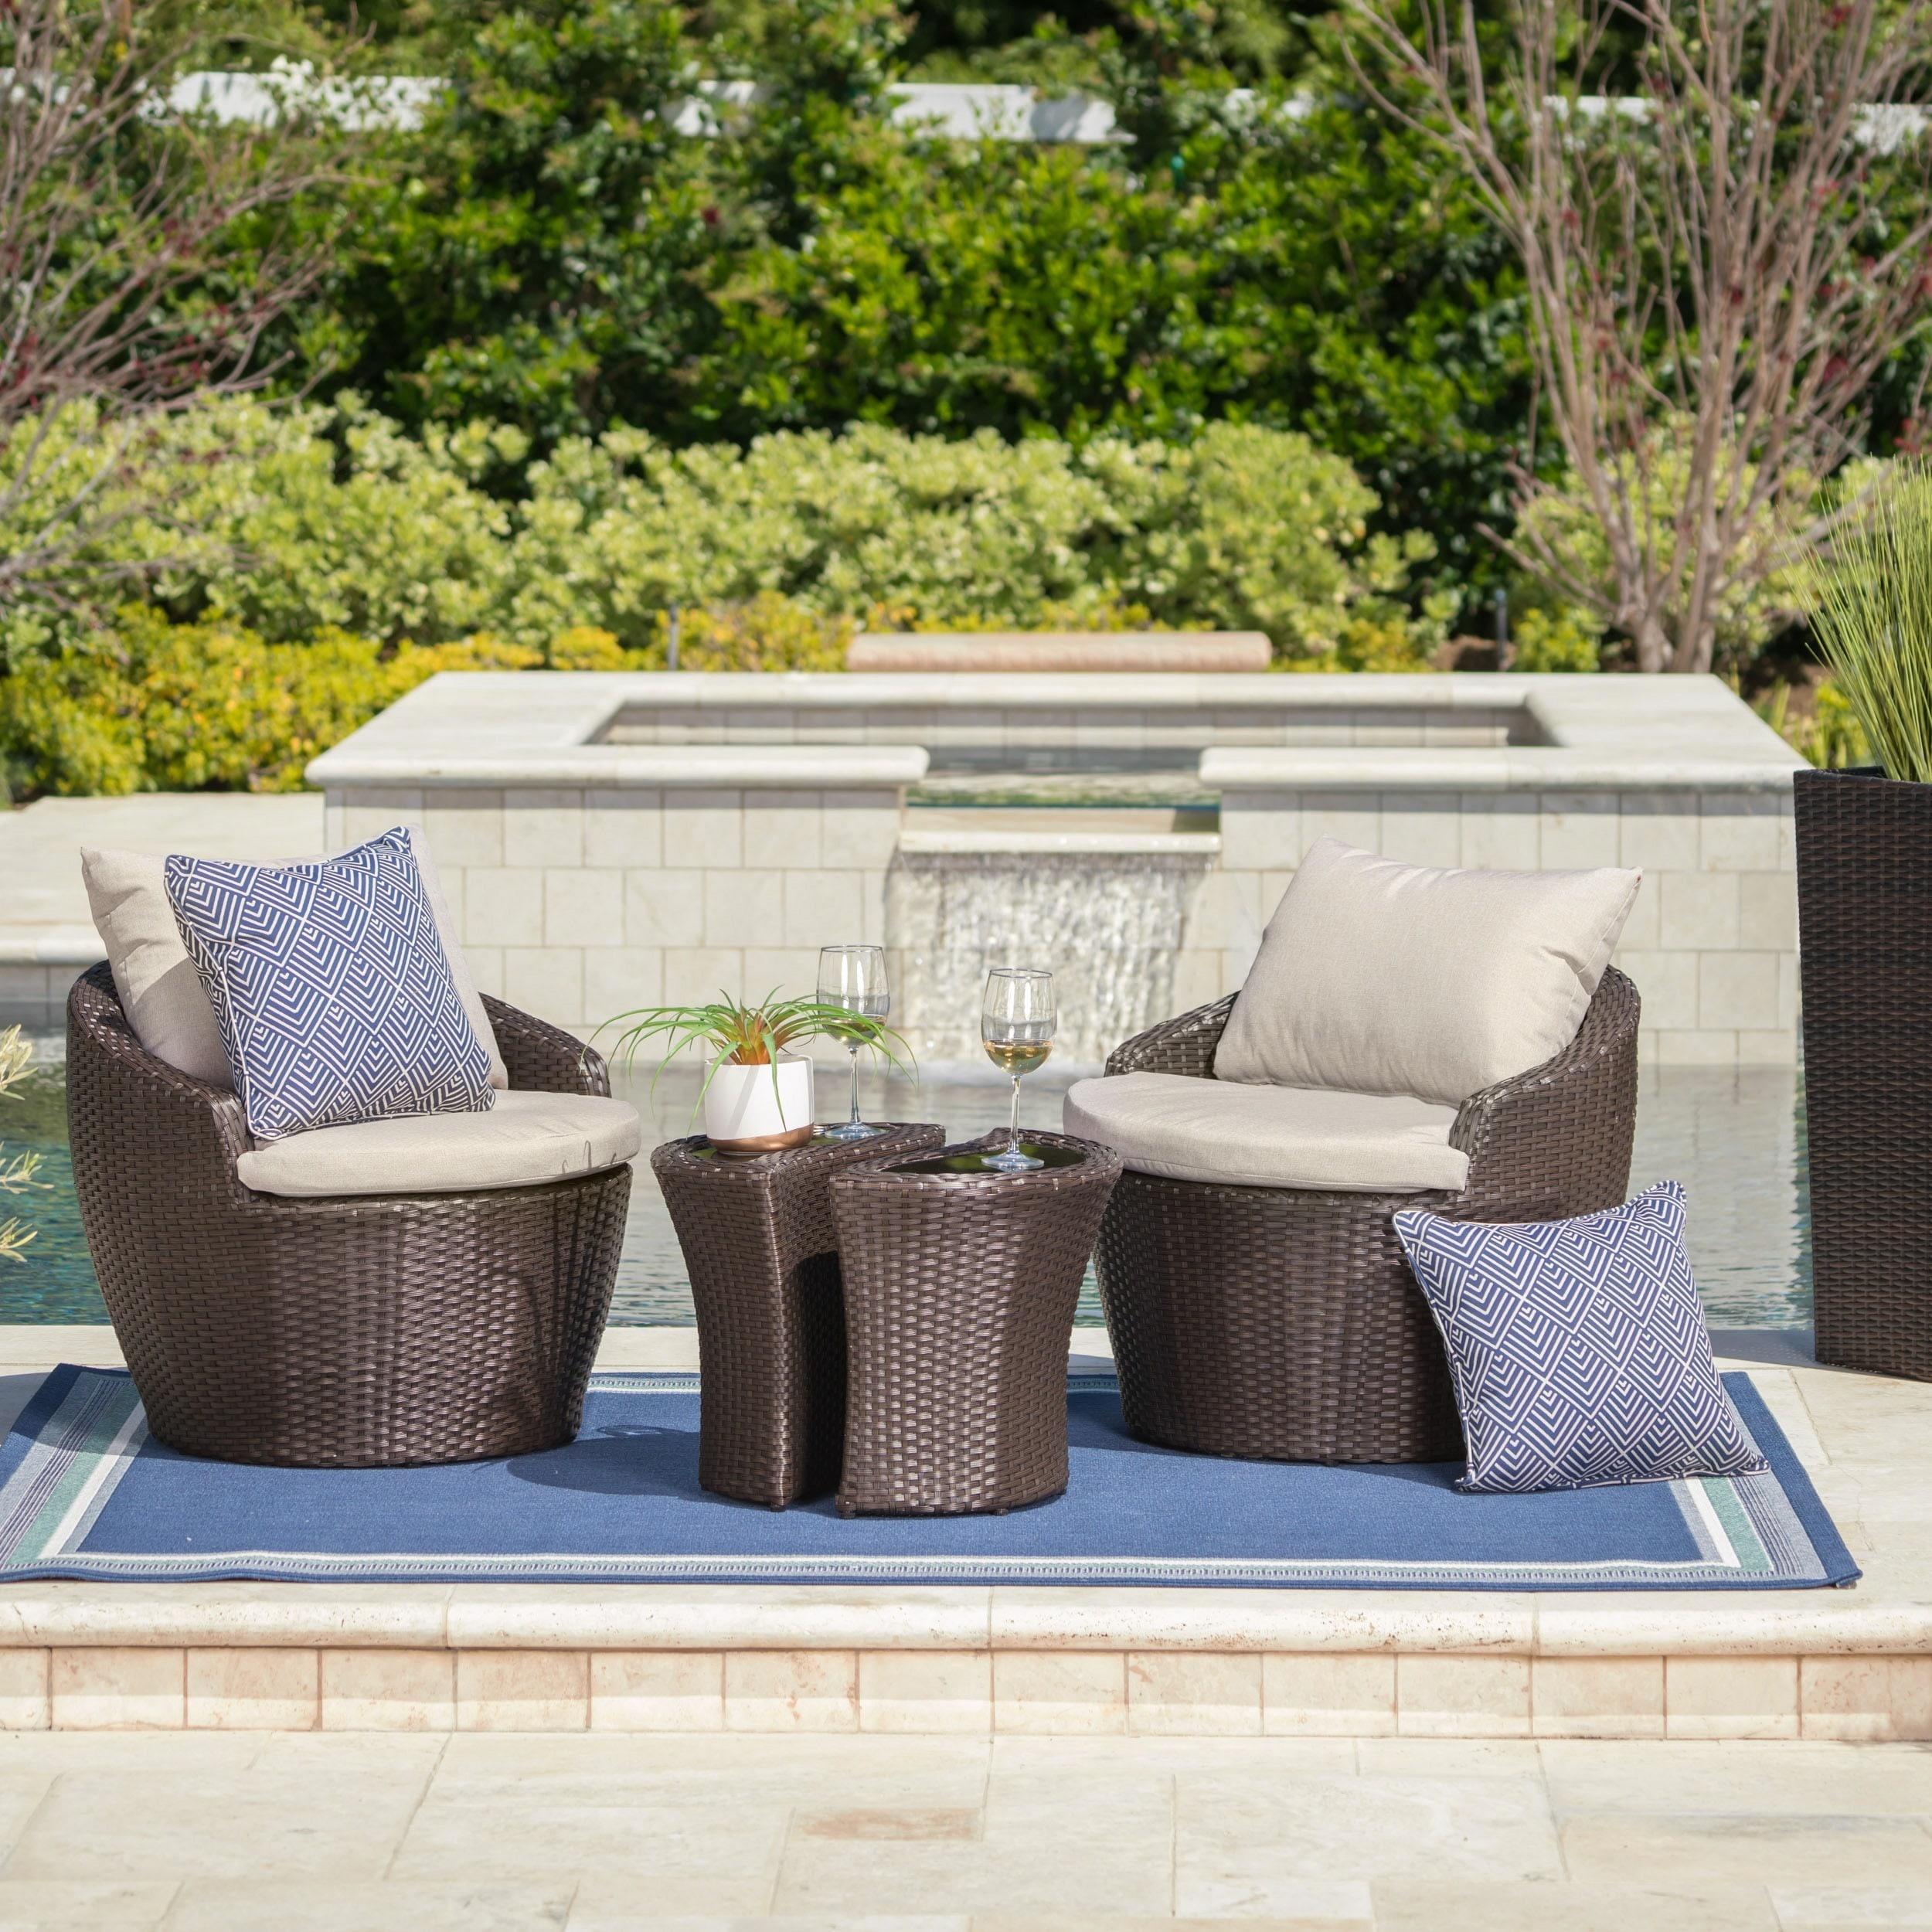 Buy Brown Outdoor Bistro Sets Online at